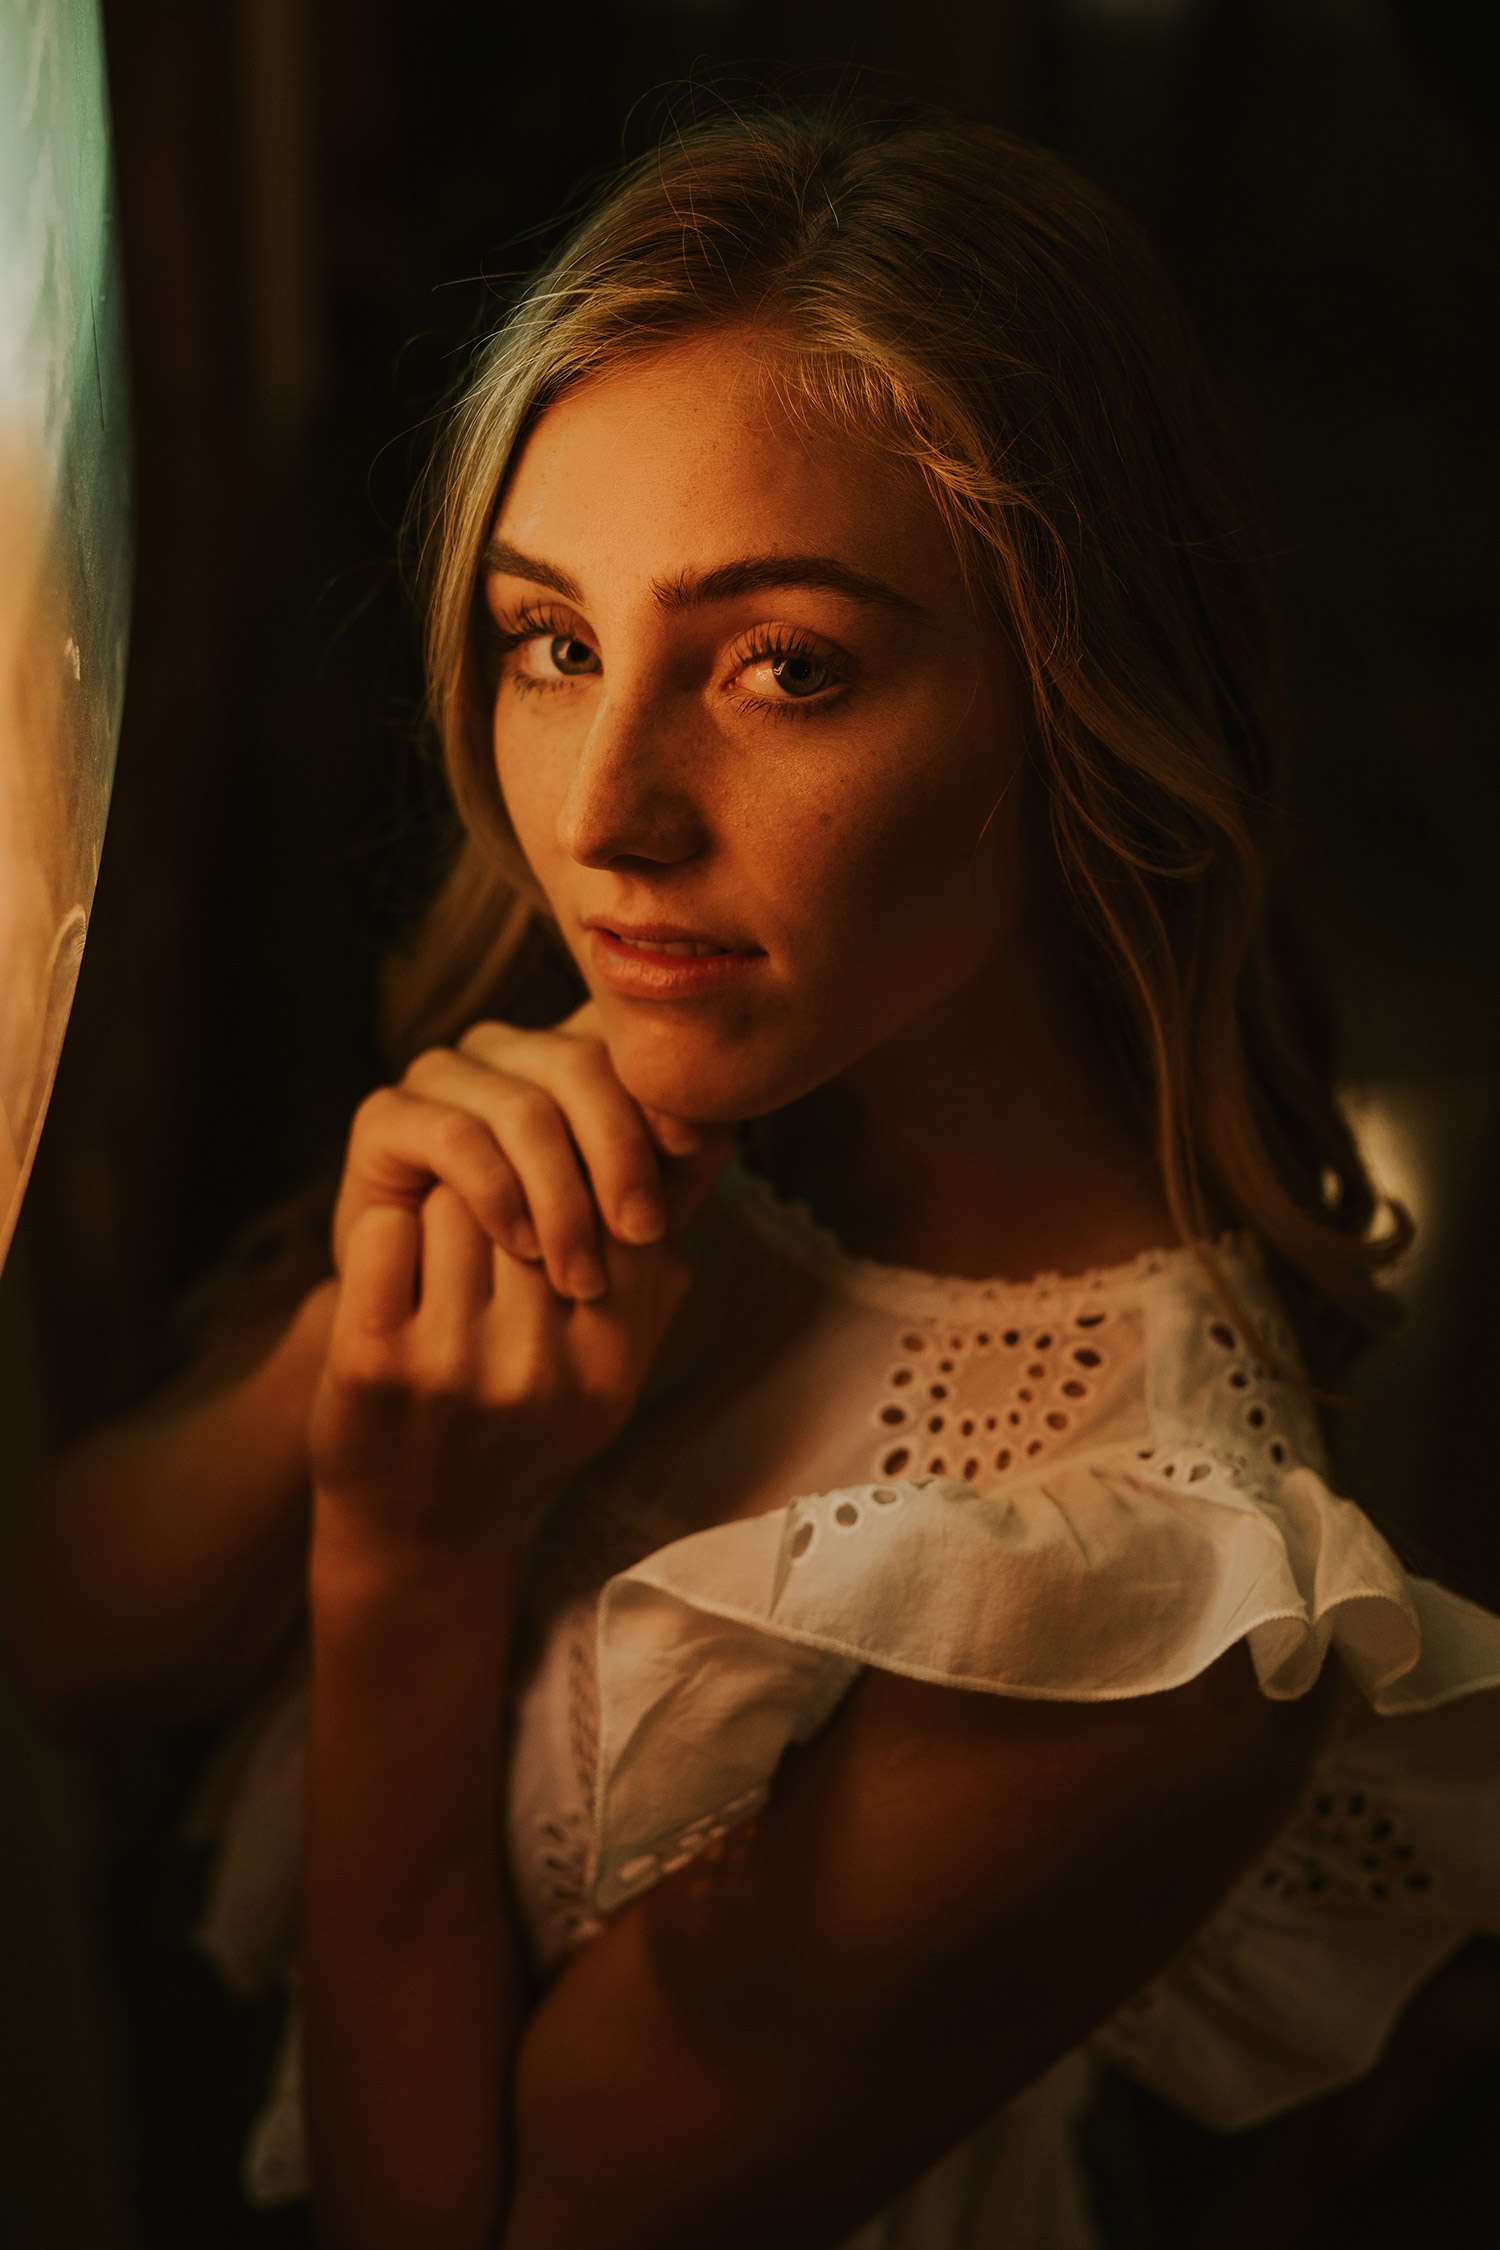 meg-senior-girl-standing-in-front-neon-lights-ankeny-high-school-desmoines-iowa-raelyn-ramey-photography-68.jpg